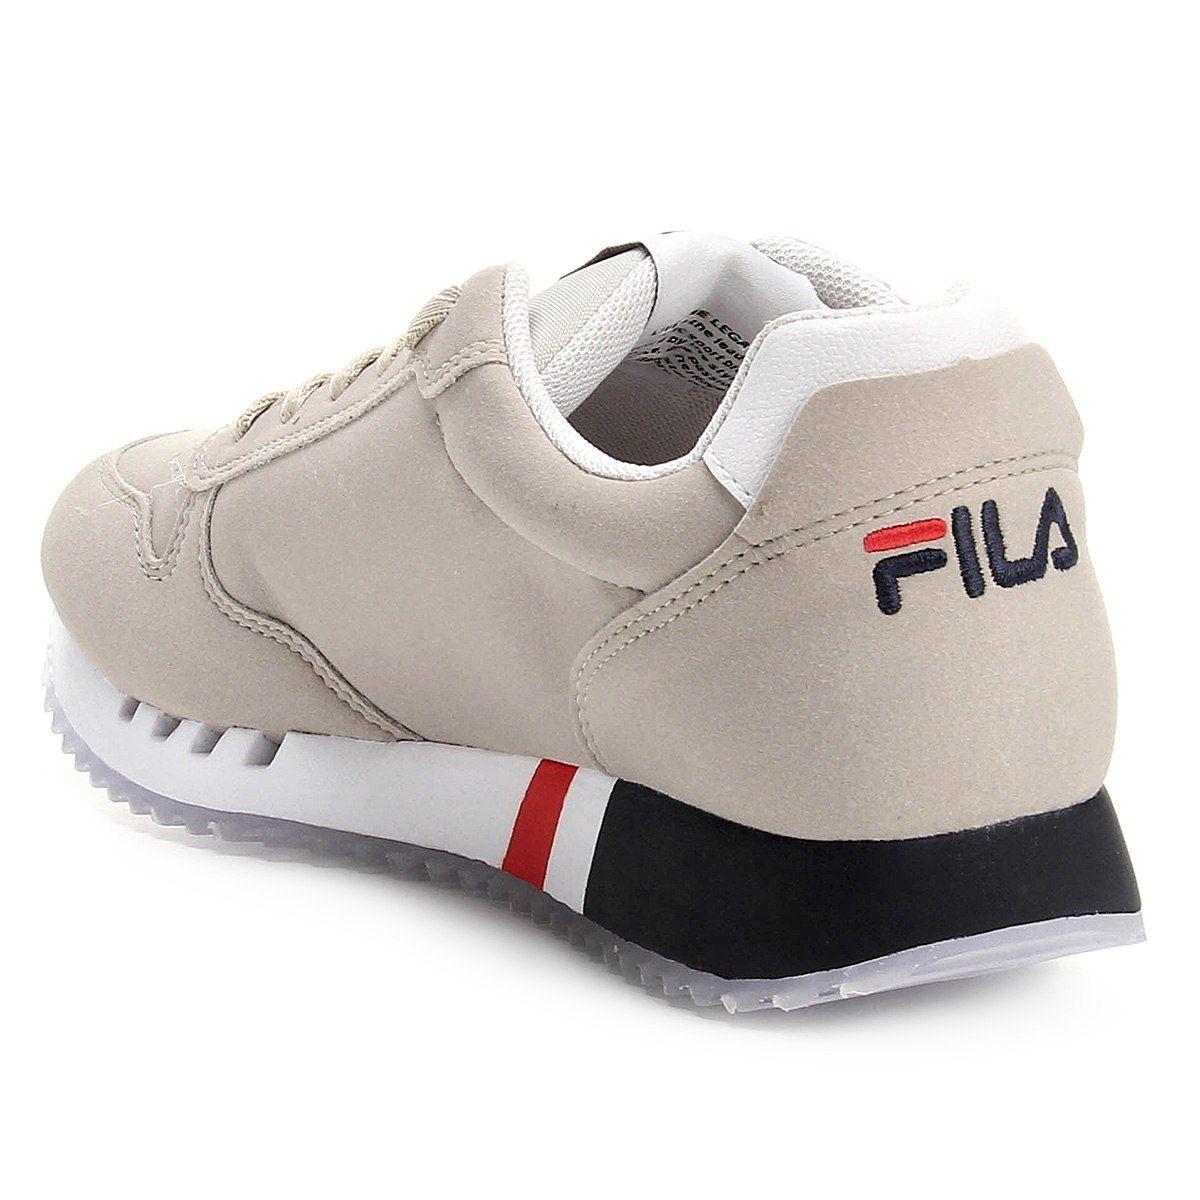 af58942c425 Tênis Fila Classic 92 SS Masculino - Cinza - Joinville Sportcenter